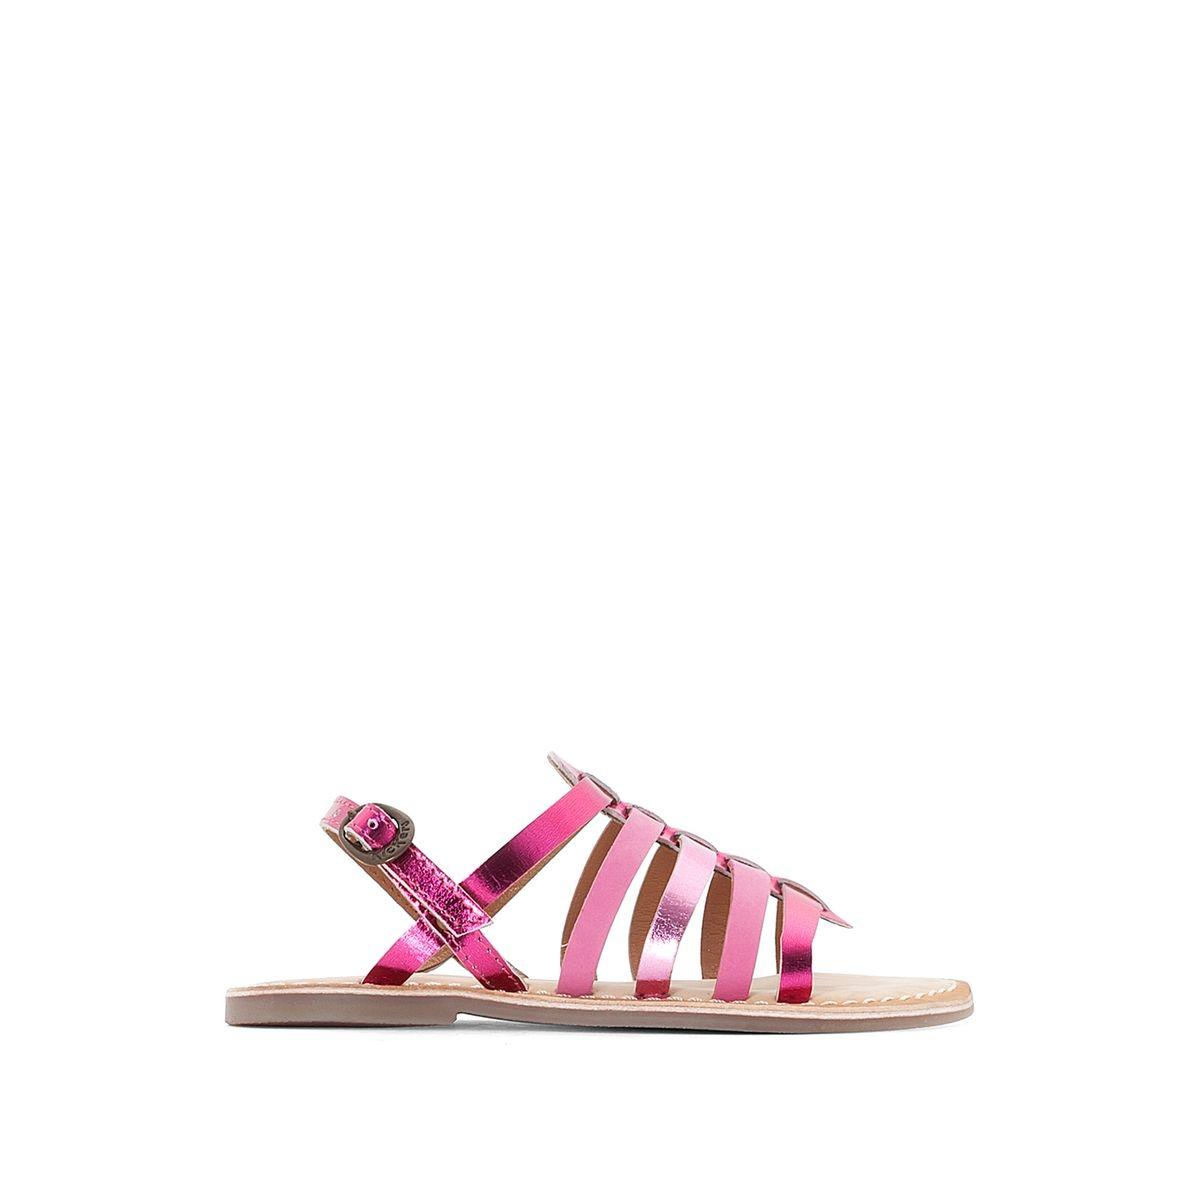 Sandales cuir DIXMILLION